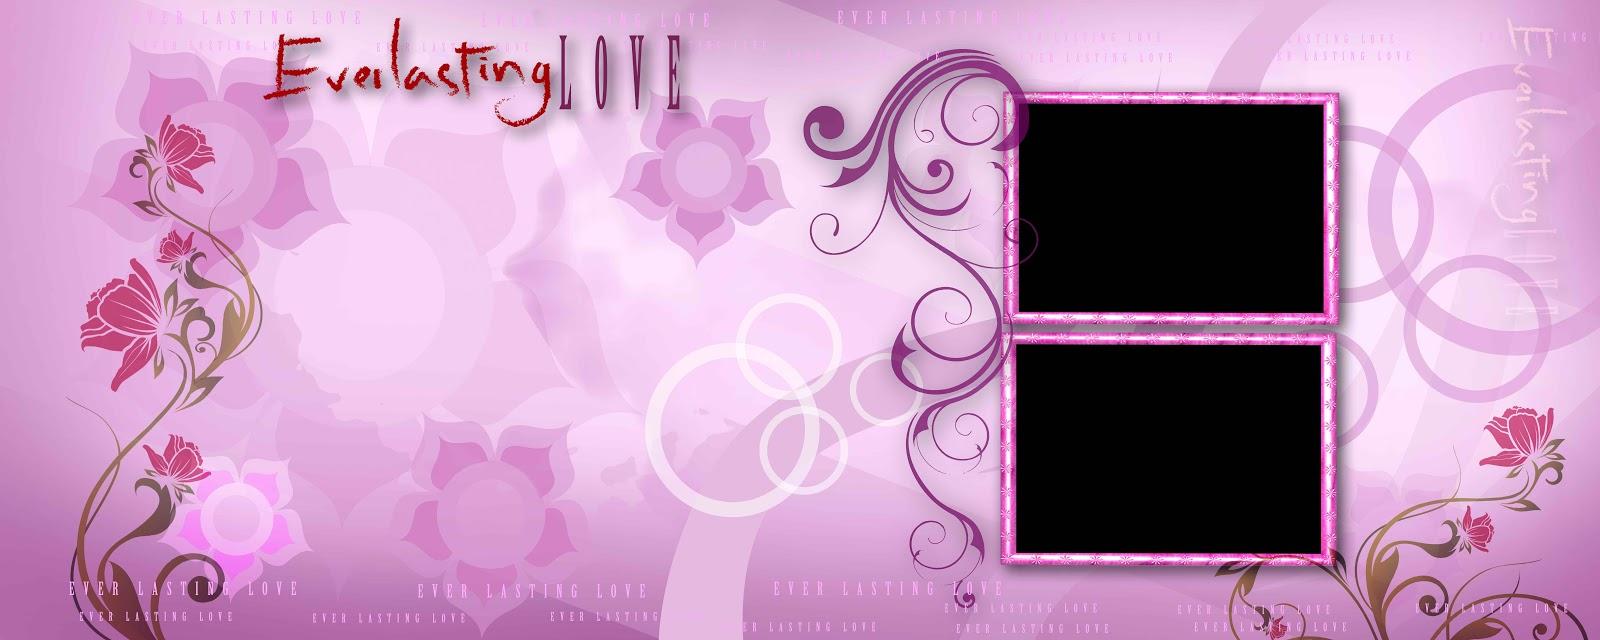 Photoshop Wedding Background Psd Free Download Mafialivin